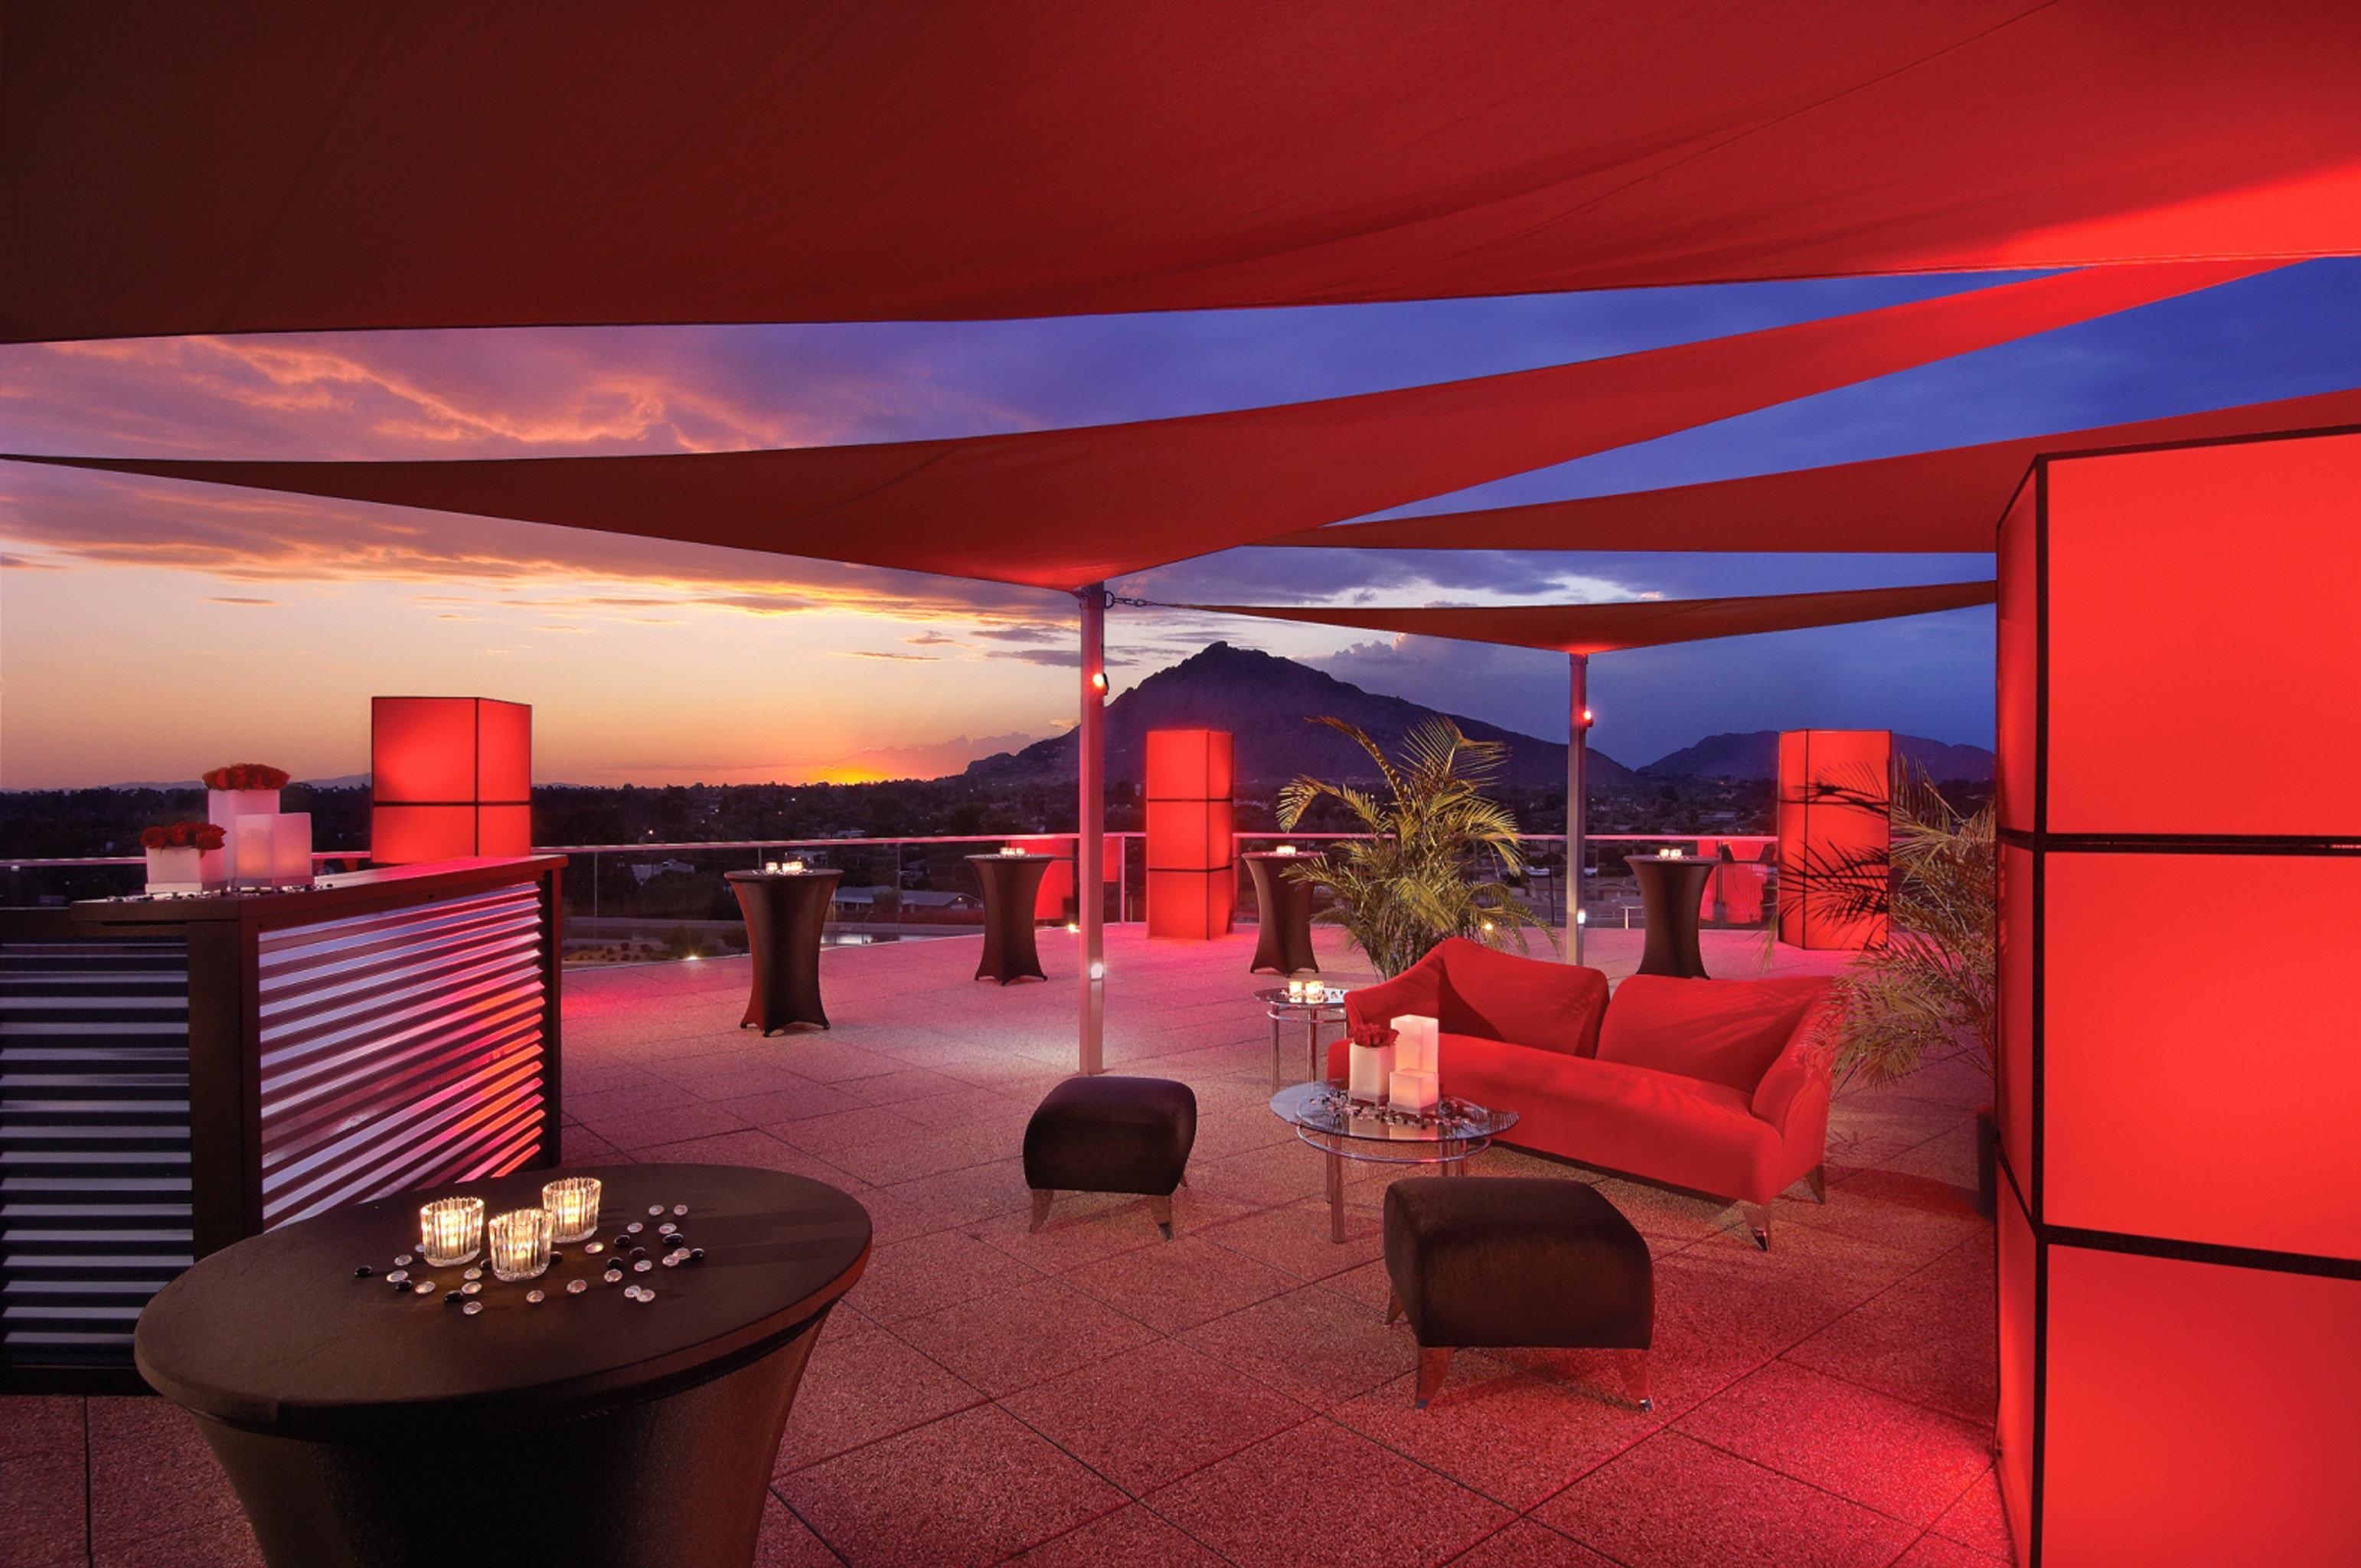 Lounge Luxury Scenic views lighting restaurant Lobby Bar Resort function hall